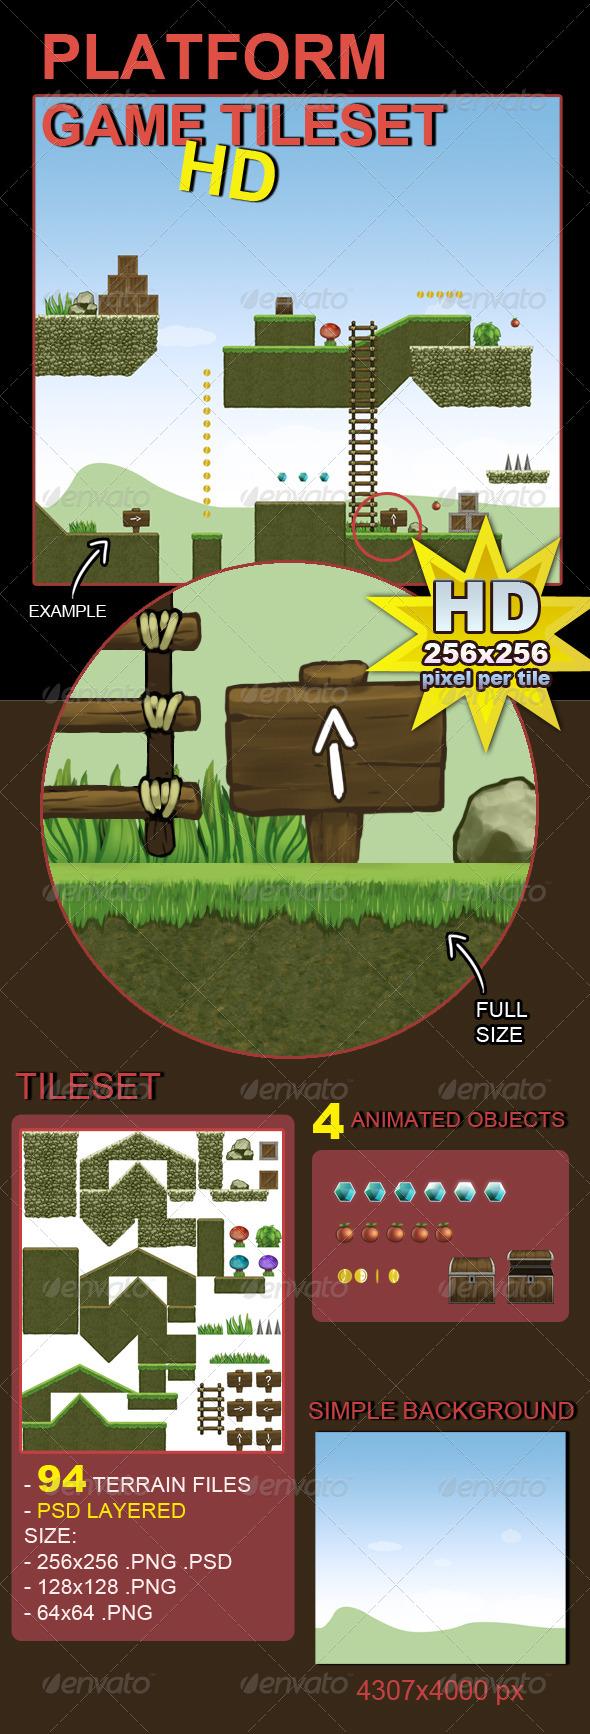 GraphicRiver Platform Game Tileset HD 5705954